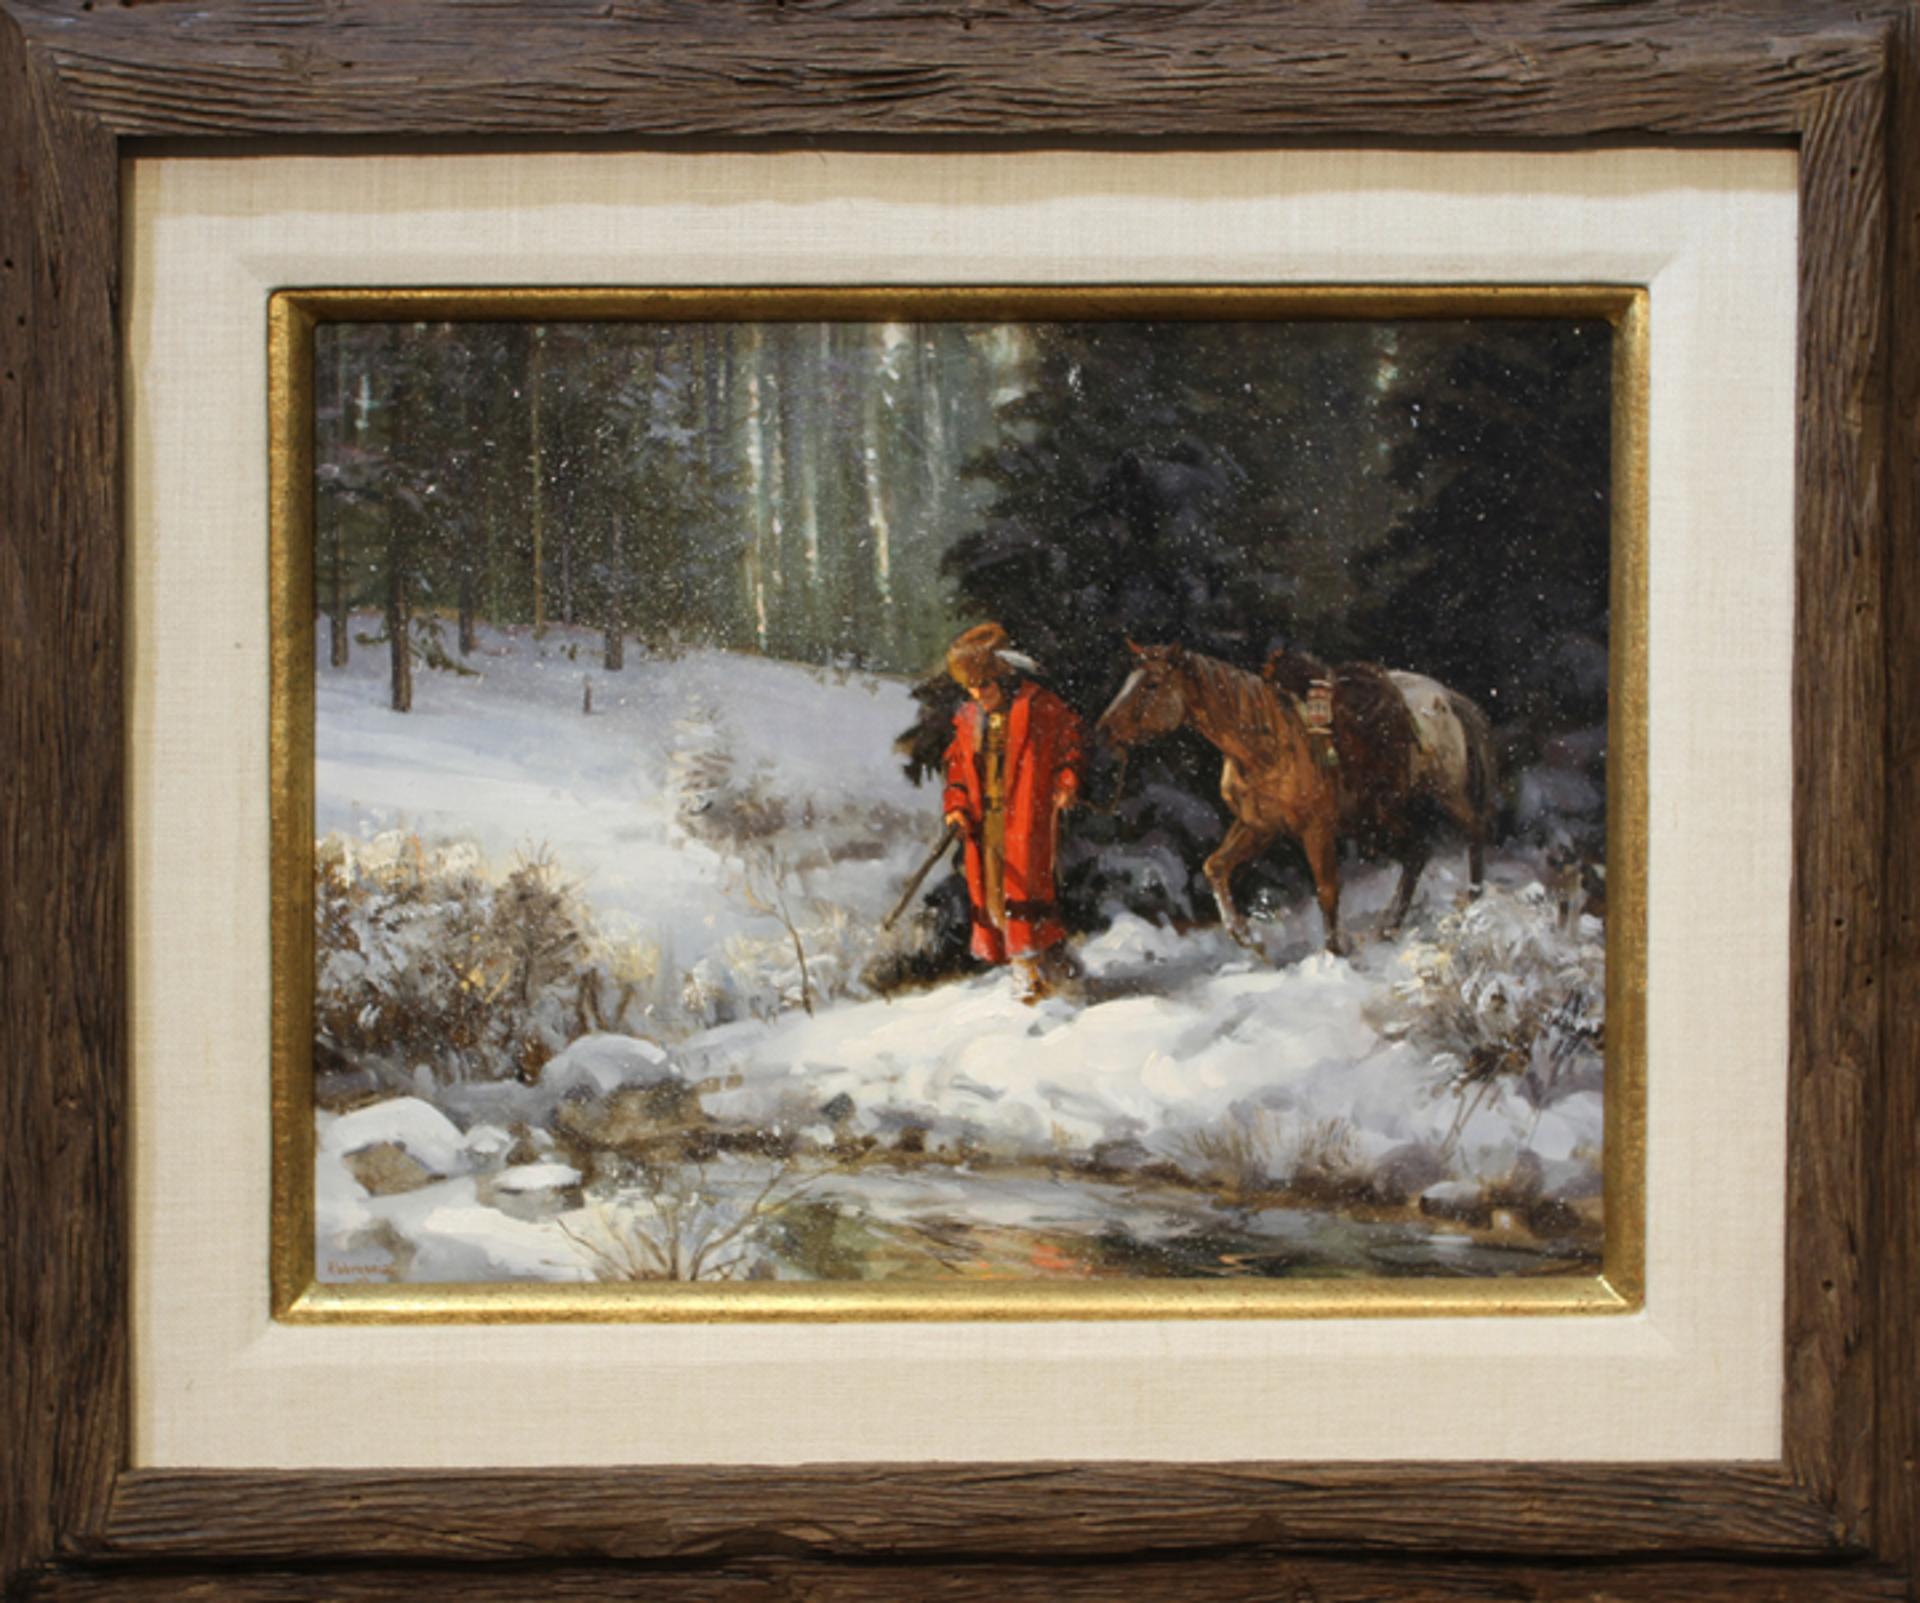 A Fresh Snow by Joe Abbrescia